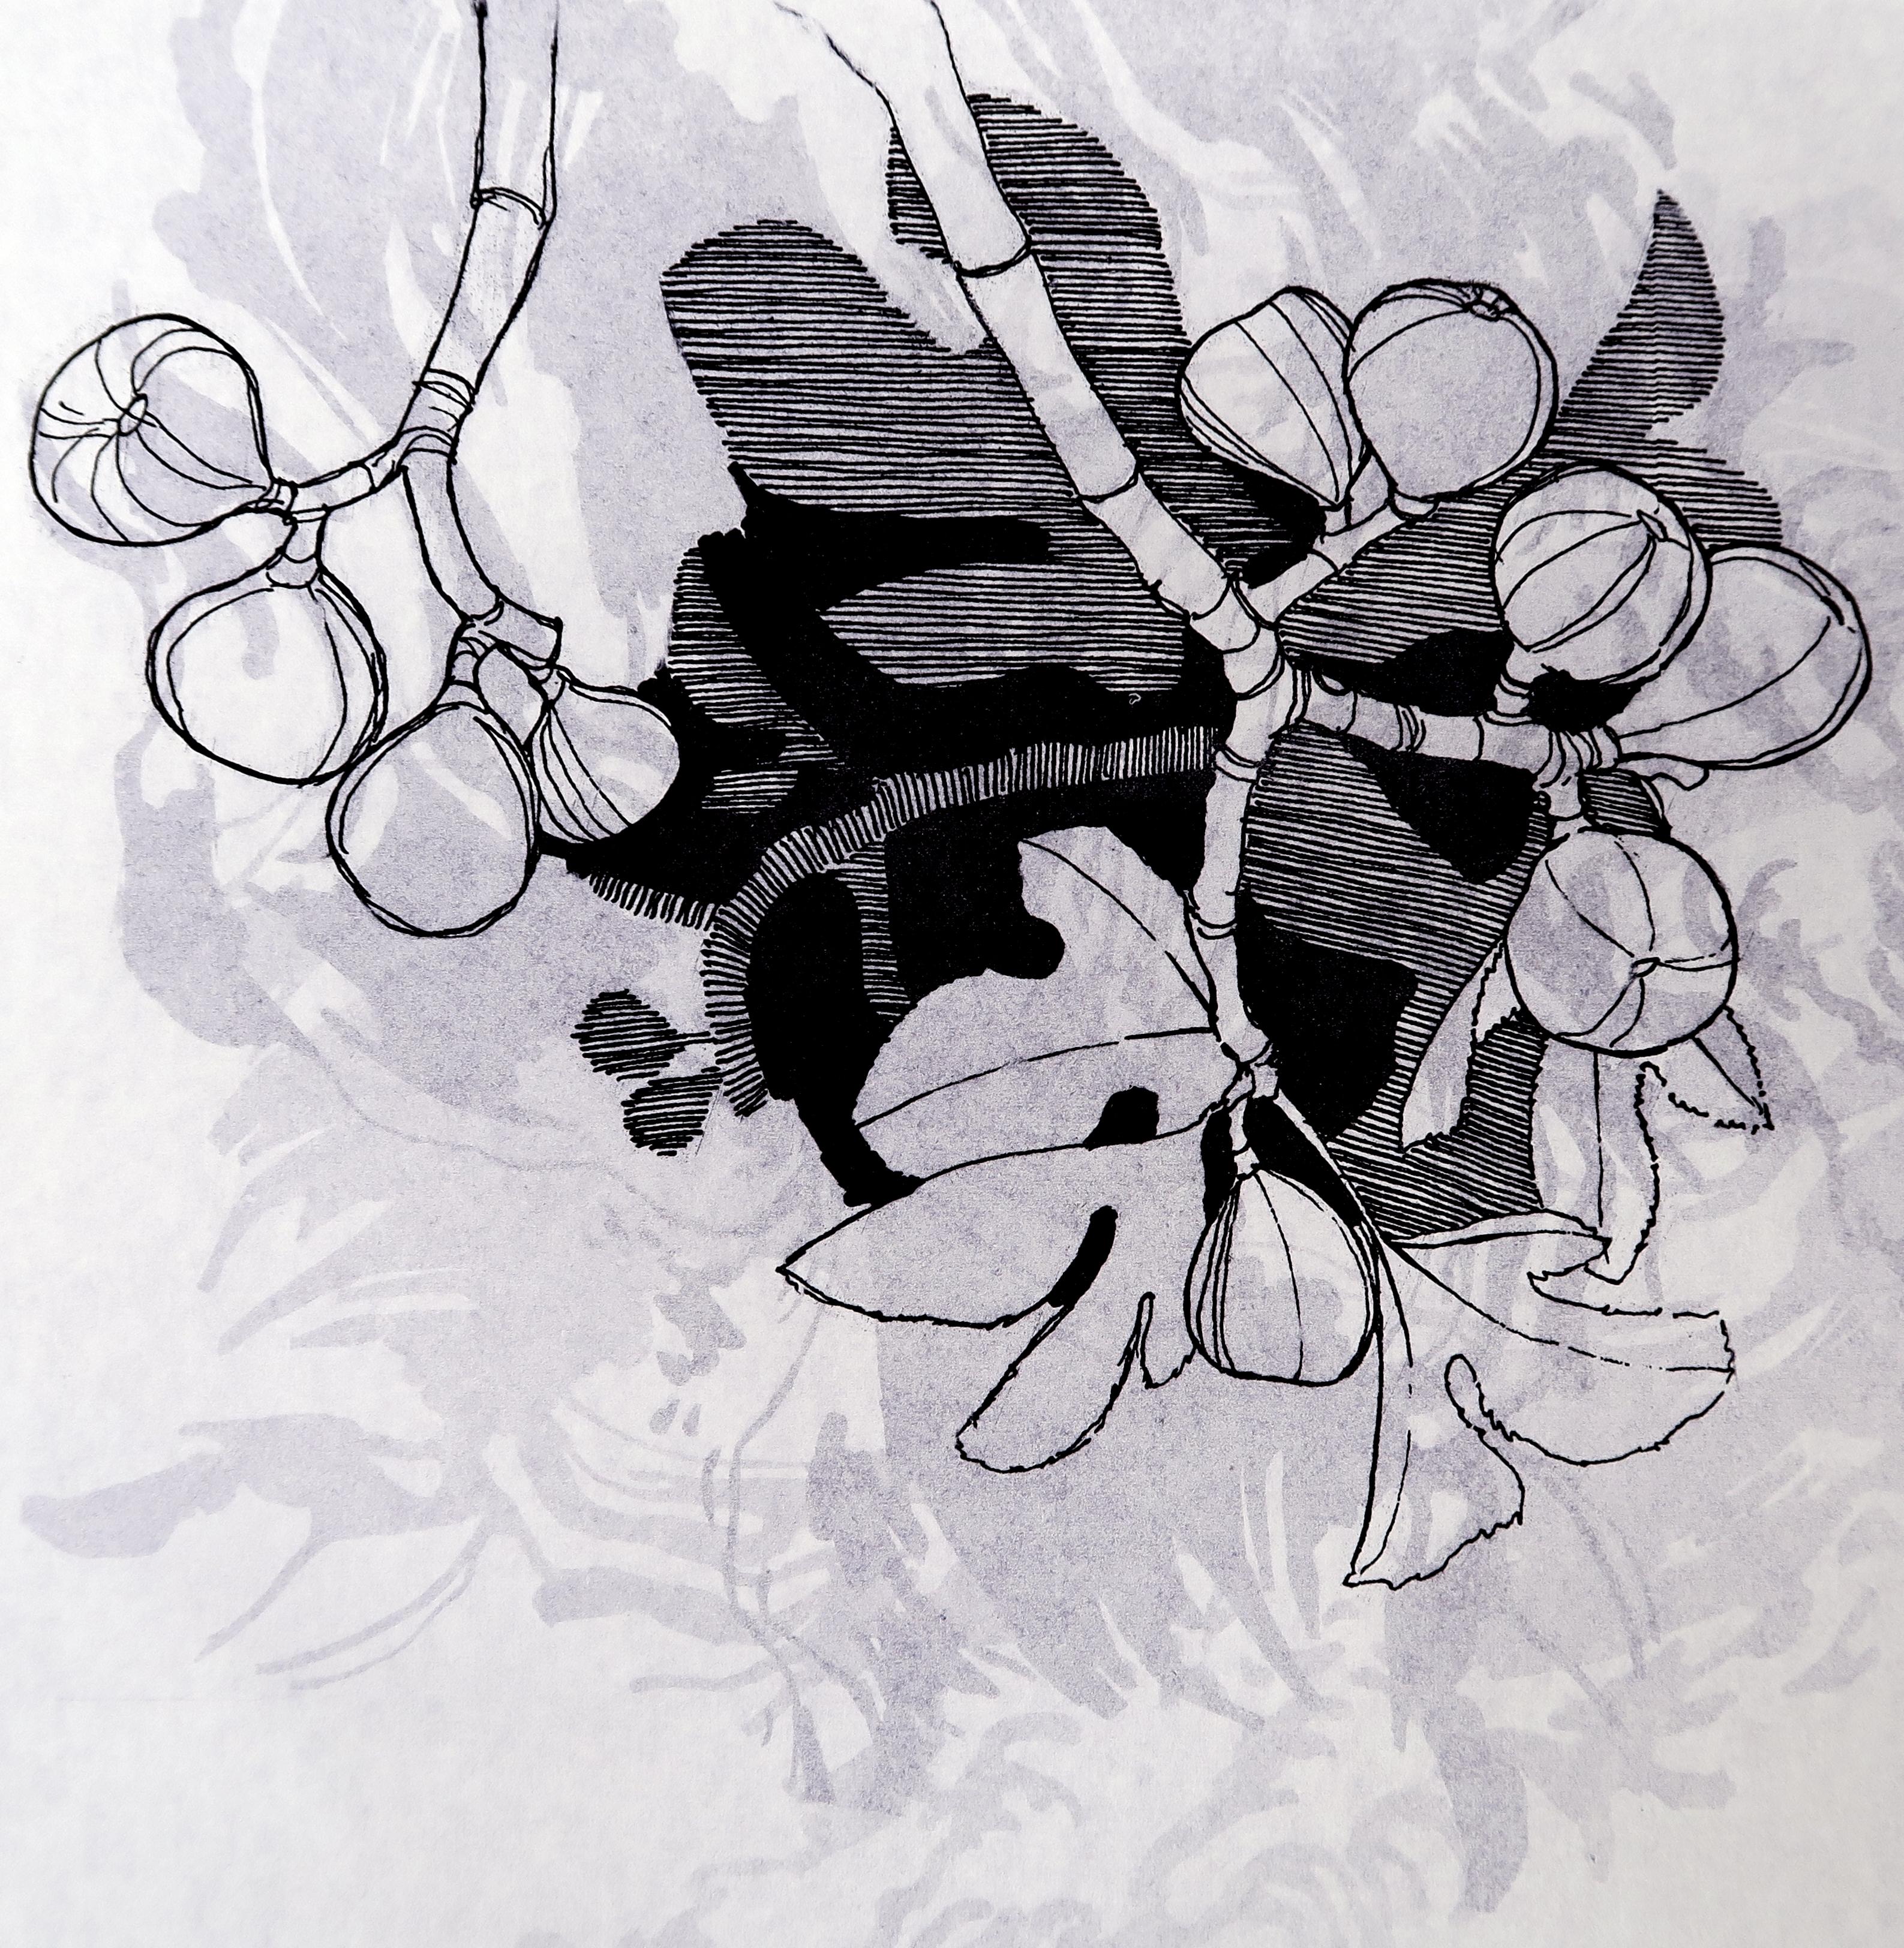 Hilary pollock artwork untitled lithograph 1 original printmaking lithography figurative art